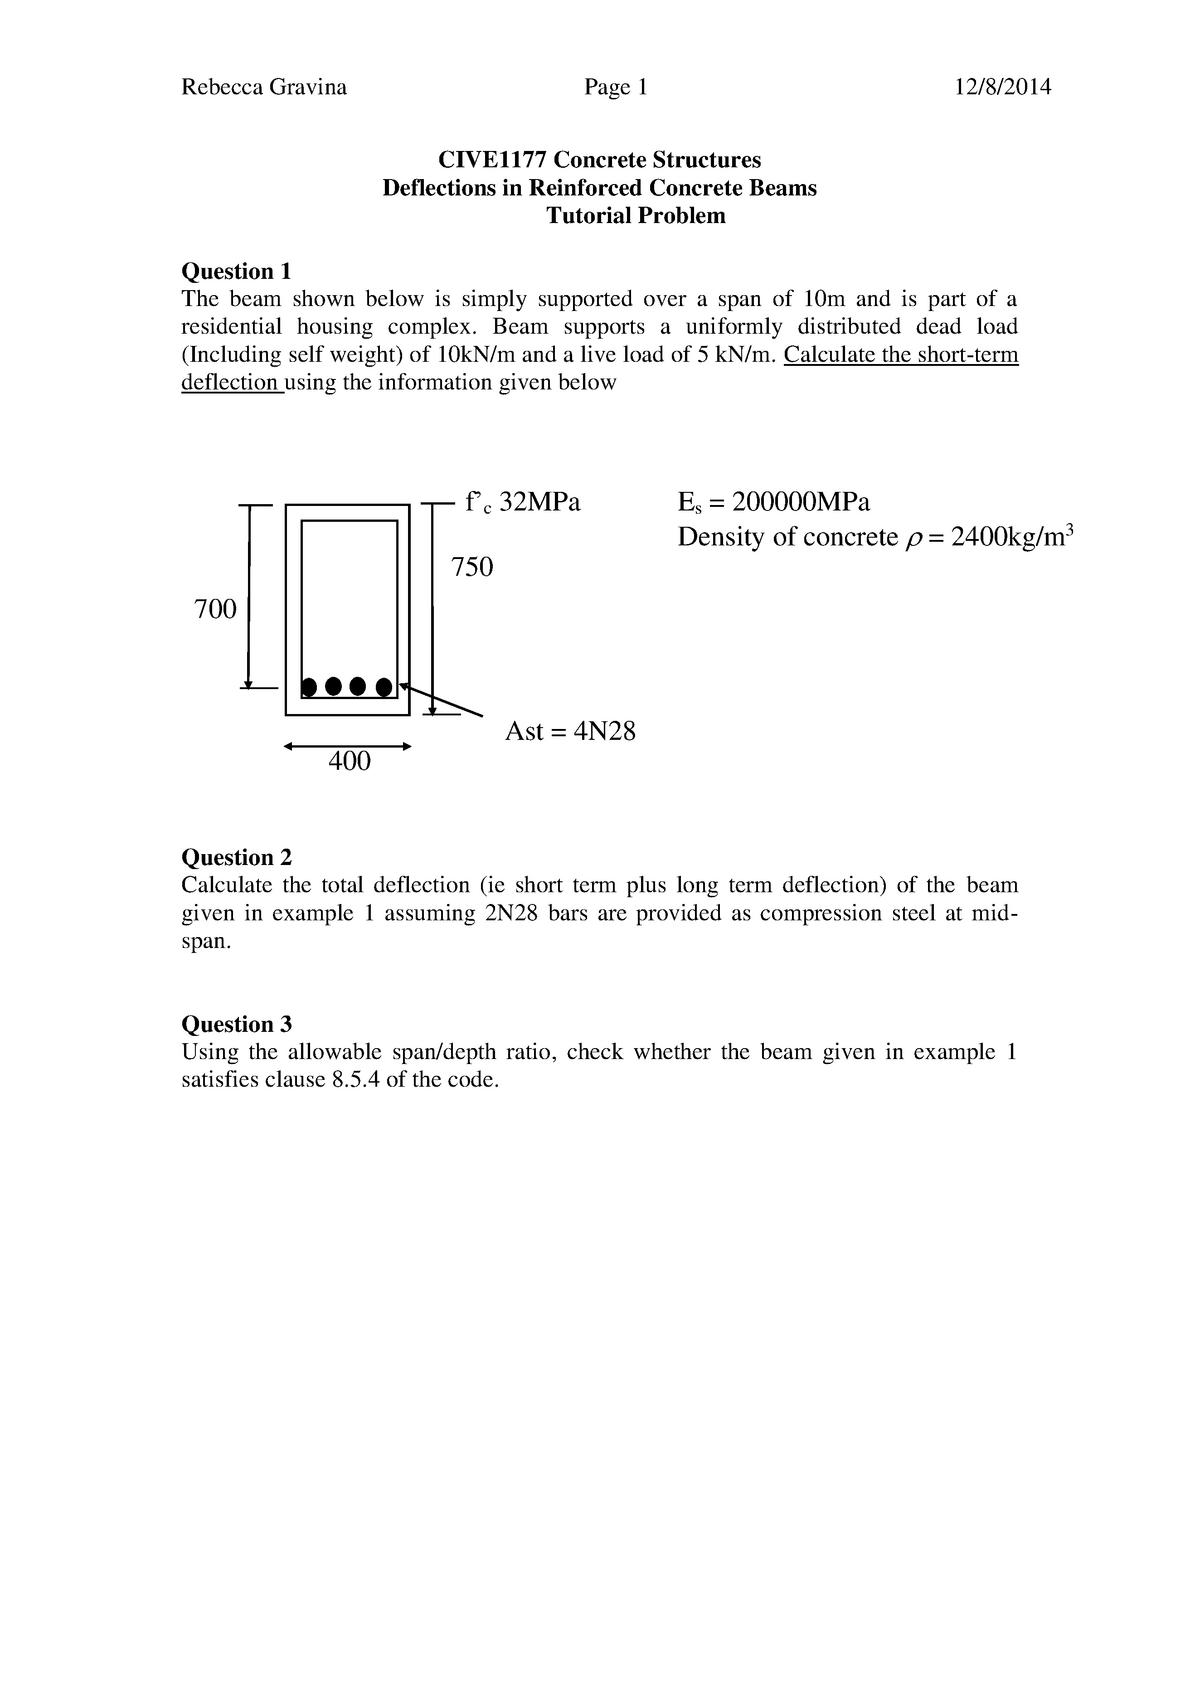 Tutorial work, questions - CIV2226 - Monash - StuDocu